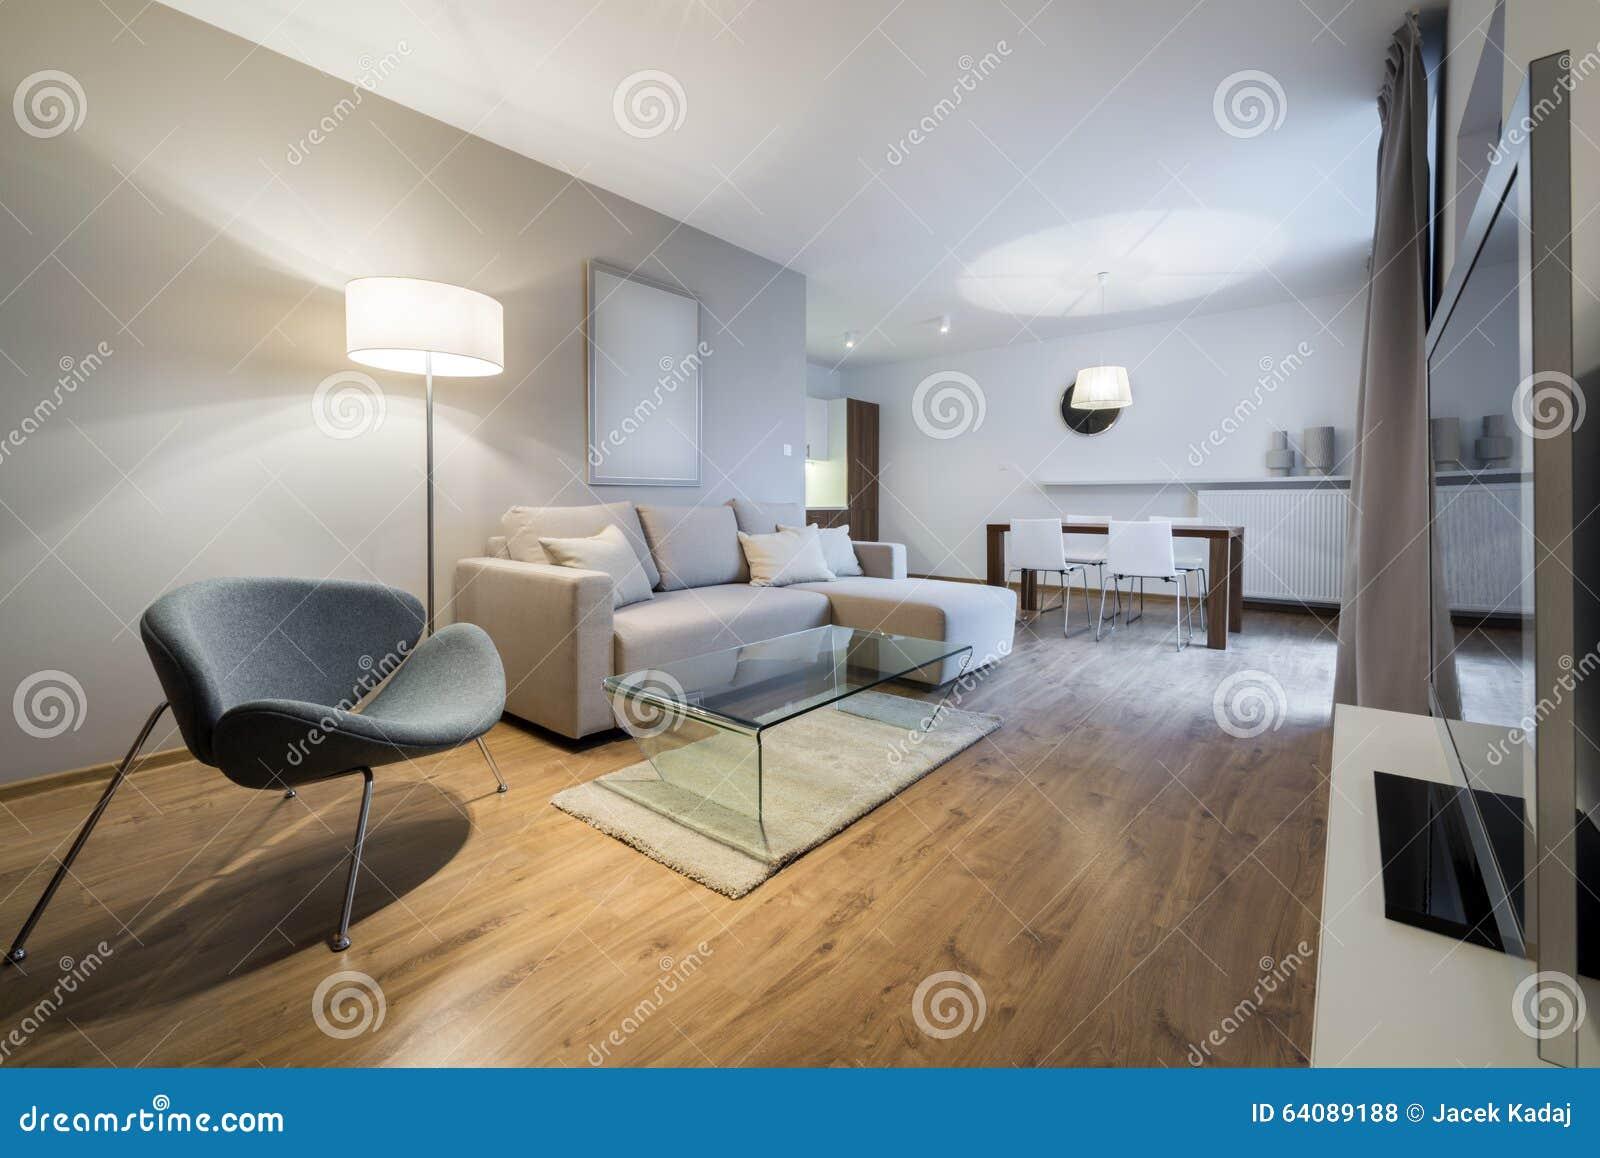 Modern interior design apartment stock photo image 64089188 for Interior design appartamento moderno